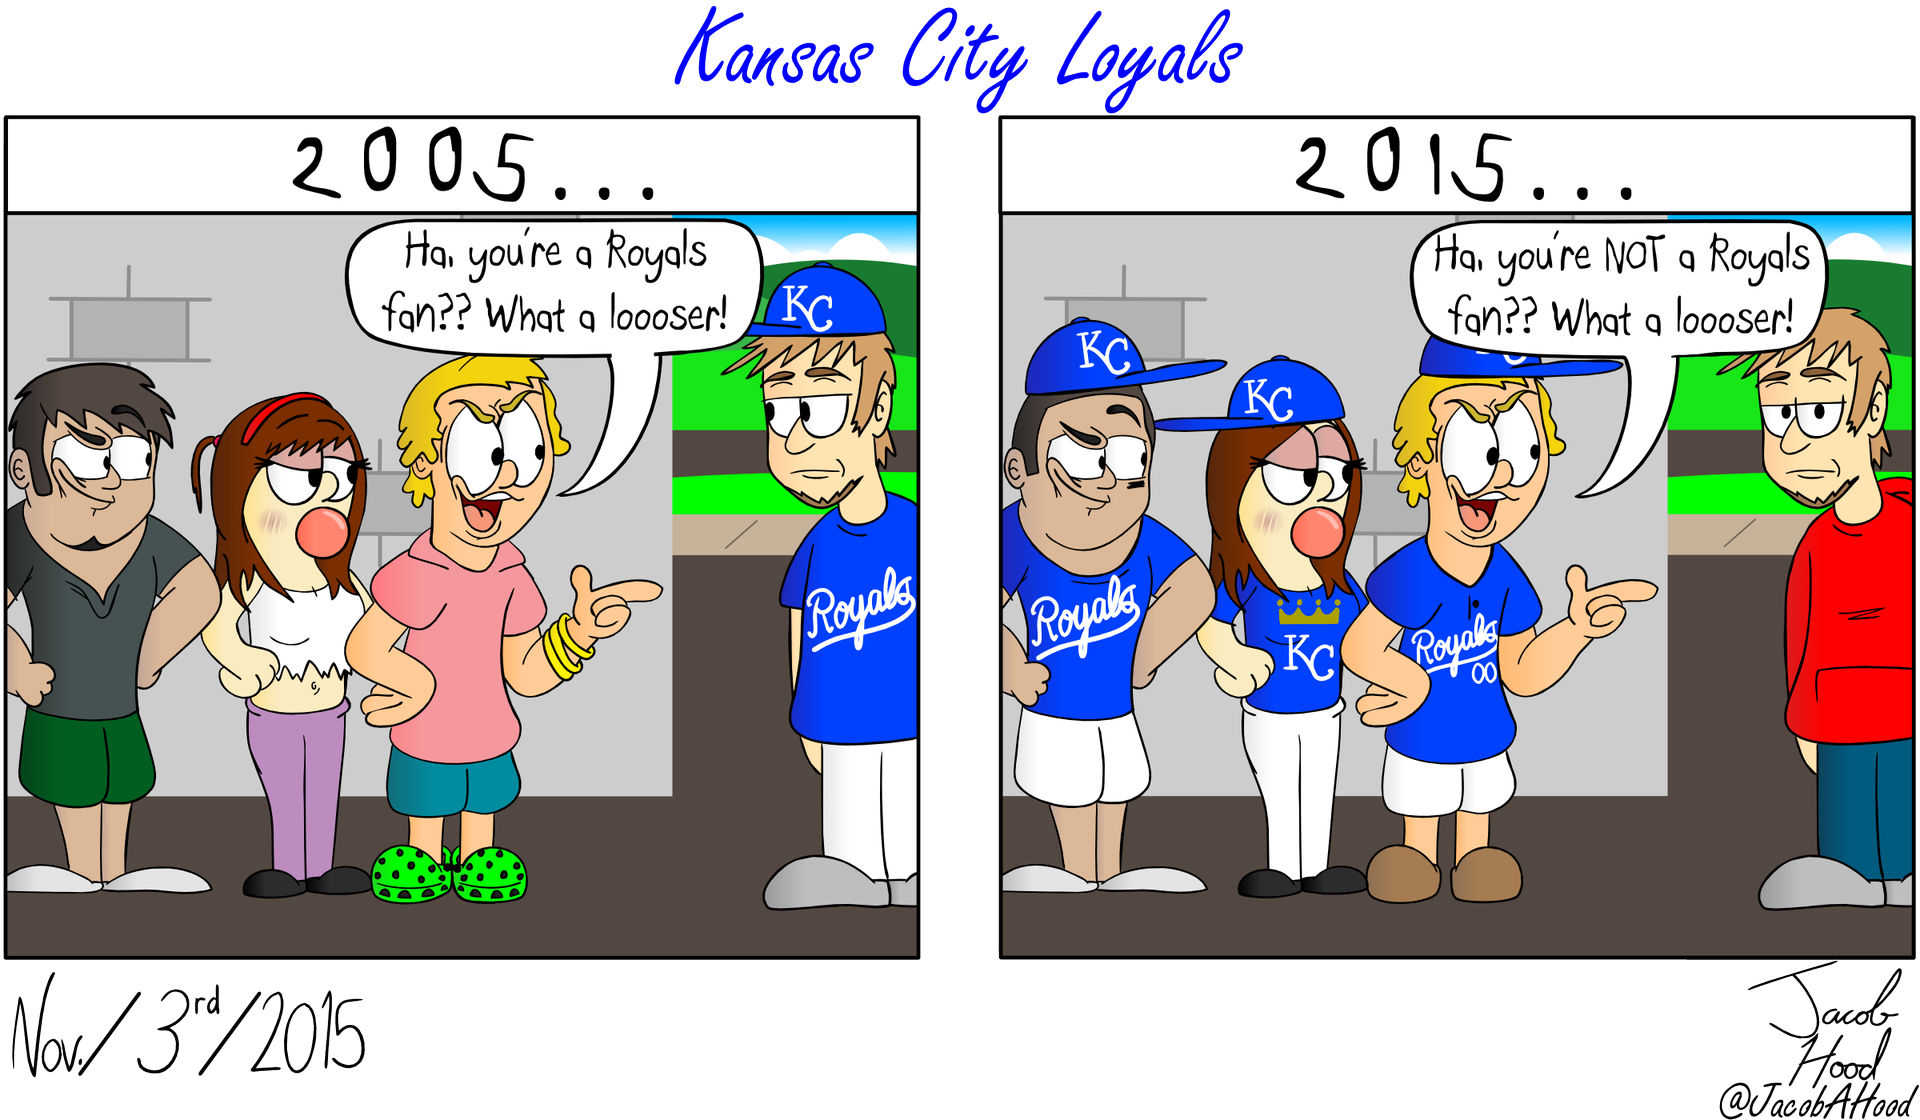 Kansas City Loyals